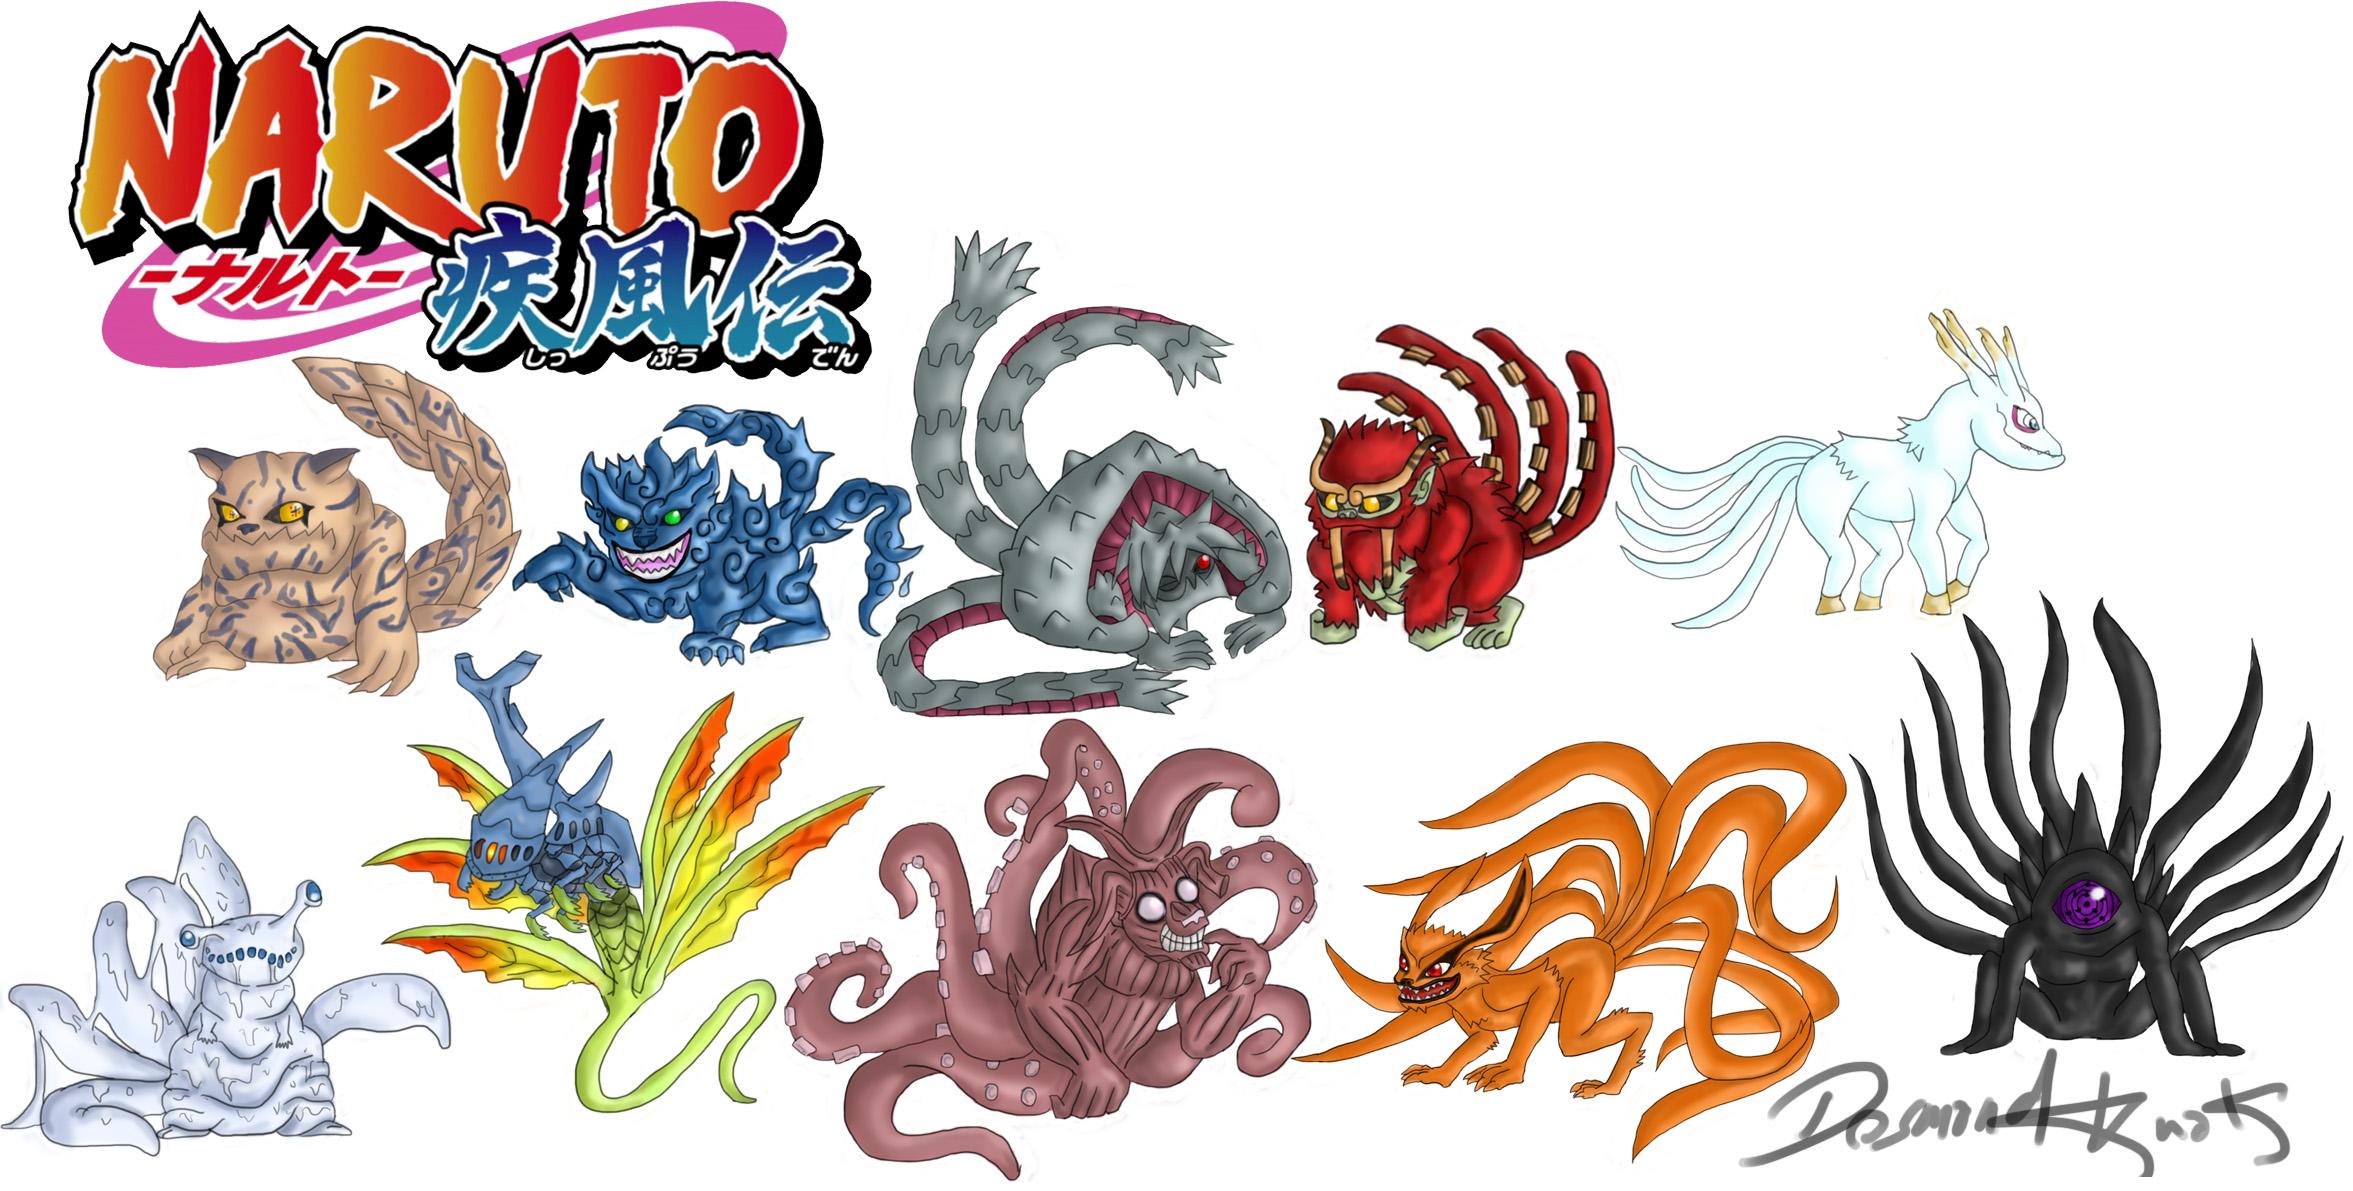 Naruto Shippuden: Tailed Beasts (Bijus) by poizonazn